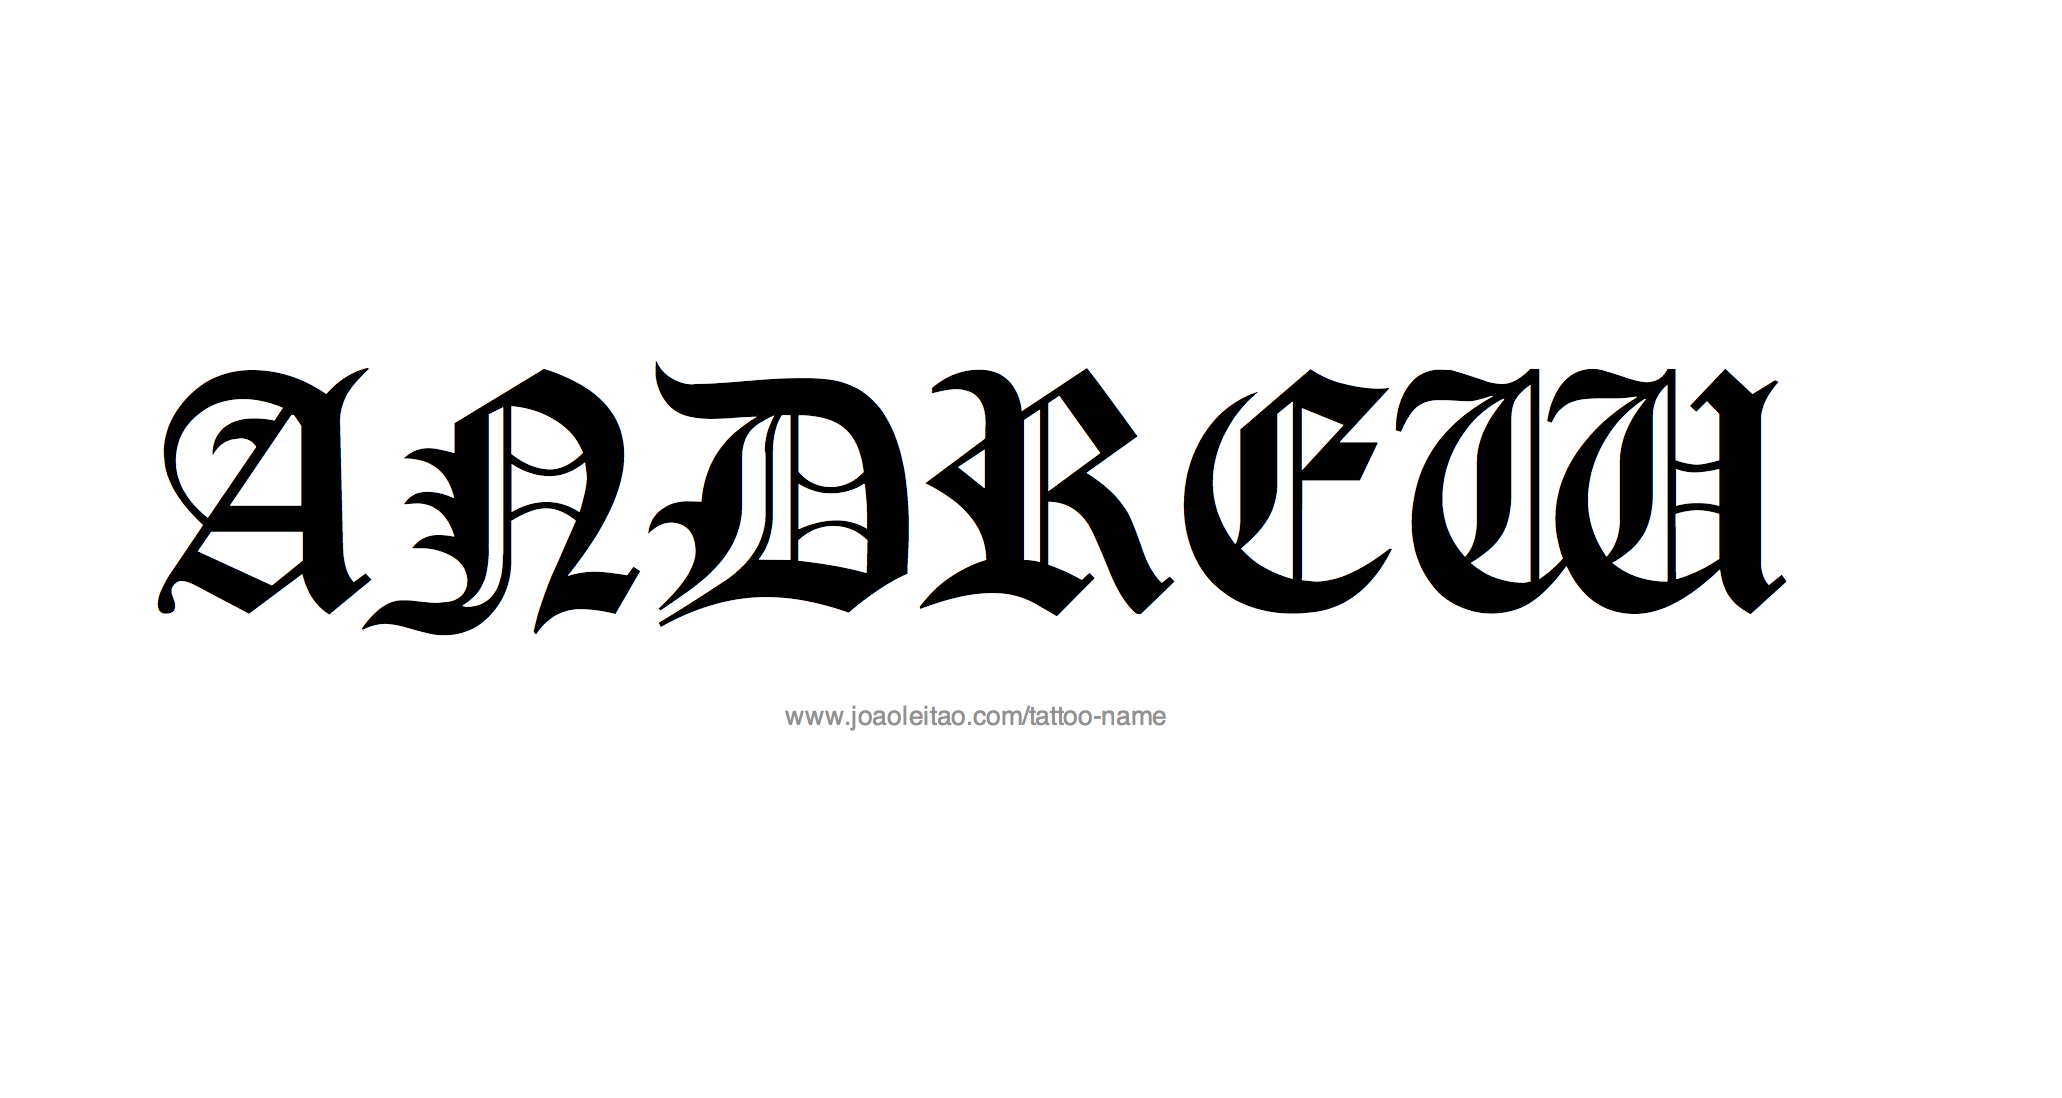 Andrew Name Tattoo Designs Name Tattoo Designs Name Tattoo Name Tattoos